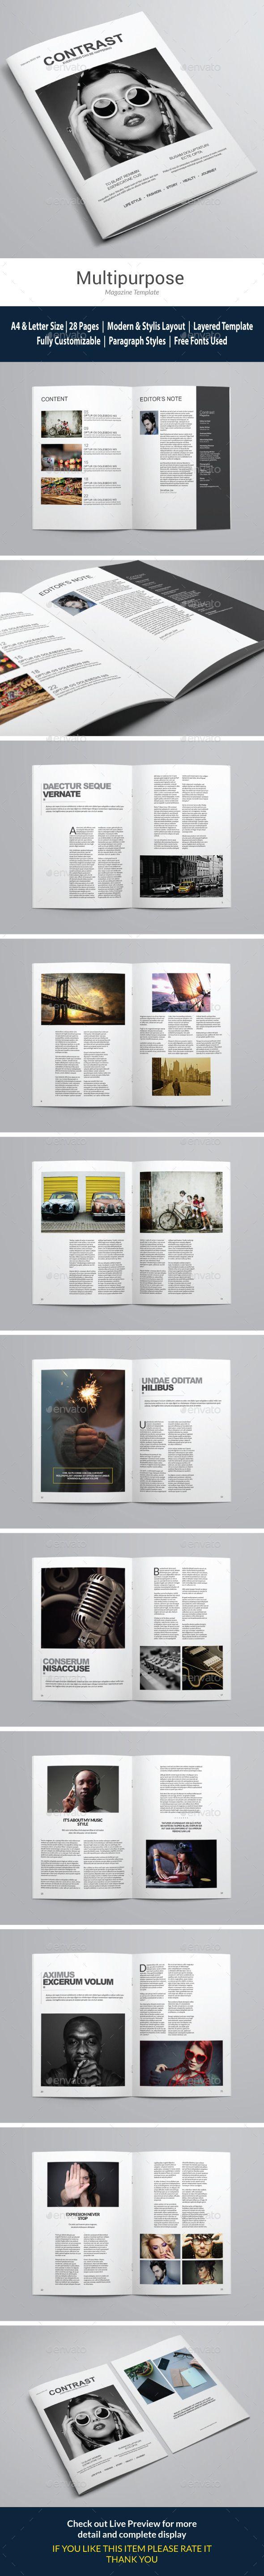 Indesign Clean Magazine Template #design #journal Download: http://graphicriver.net/item/indesign-clean-magazine-vol-1/12804647?ref=ksioks